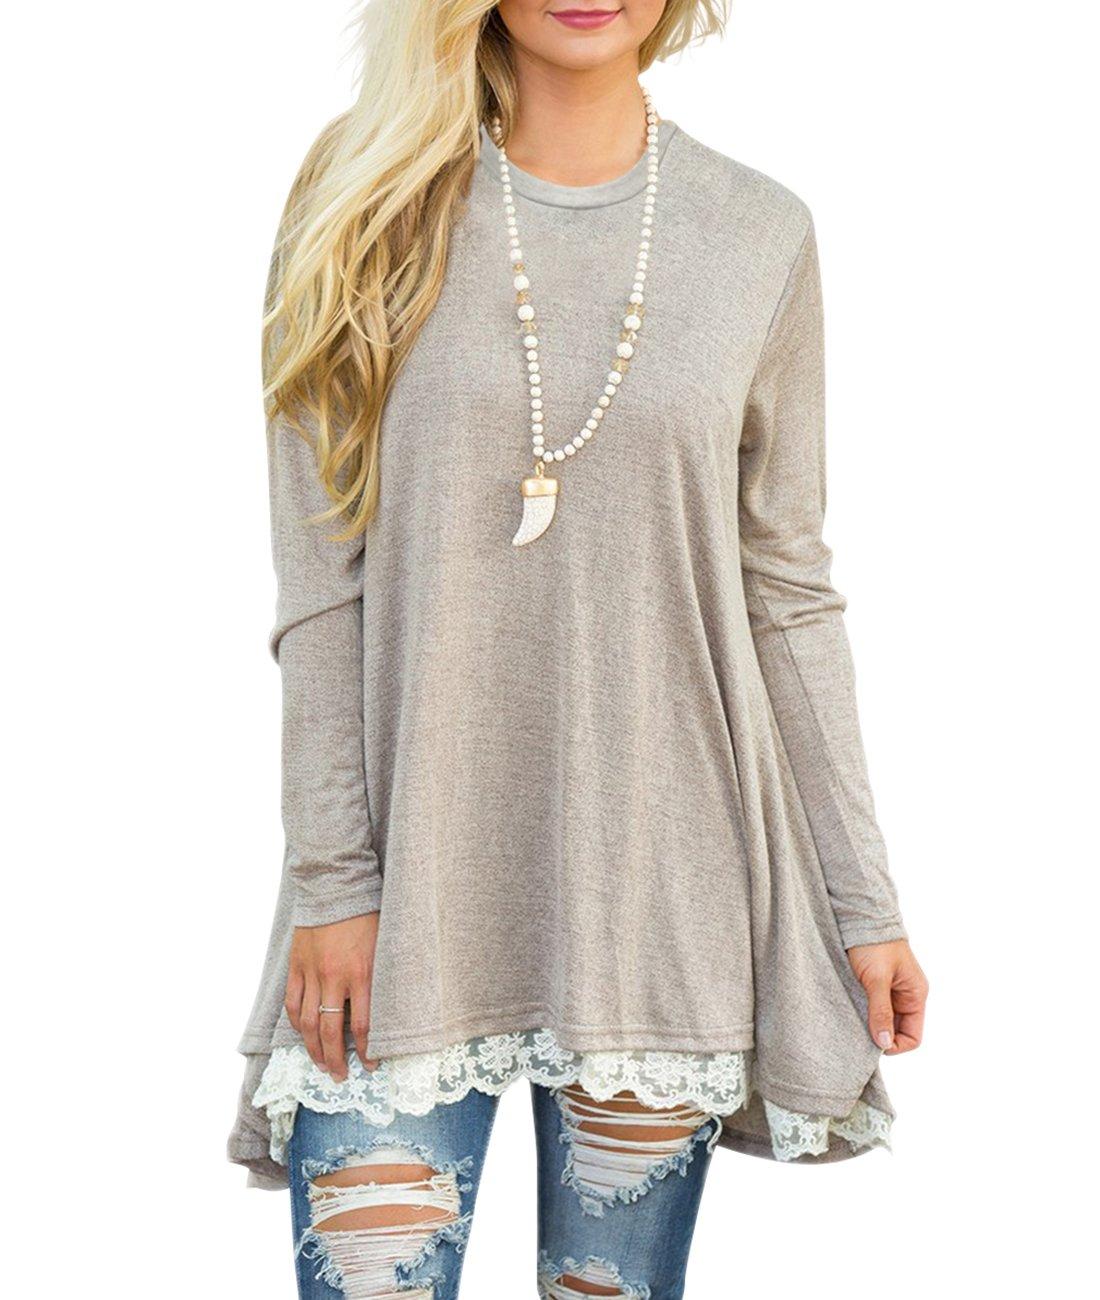 Sanifer Women Lace Long Sleeve Tunic Top Blouse (XX-Large, Khaki)